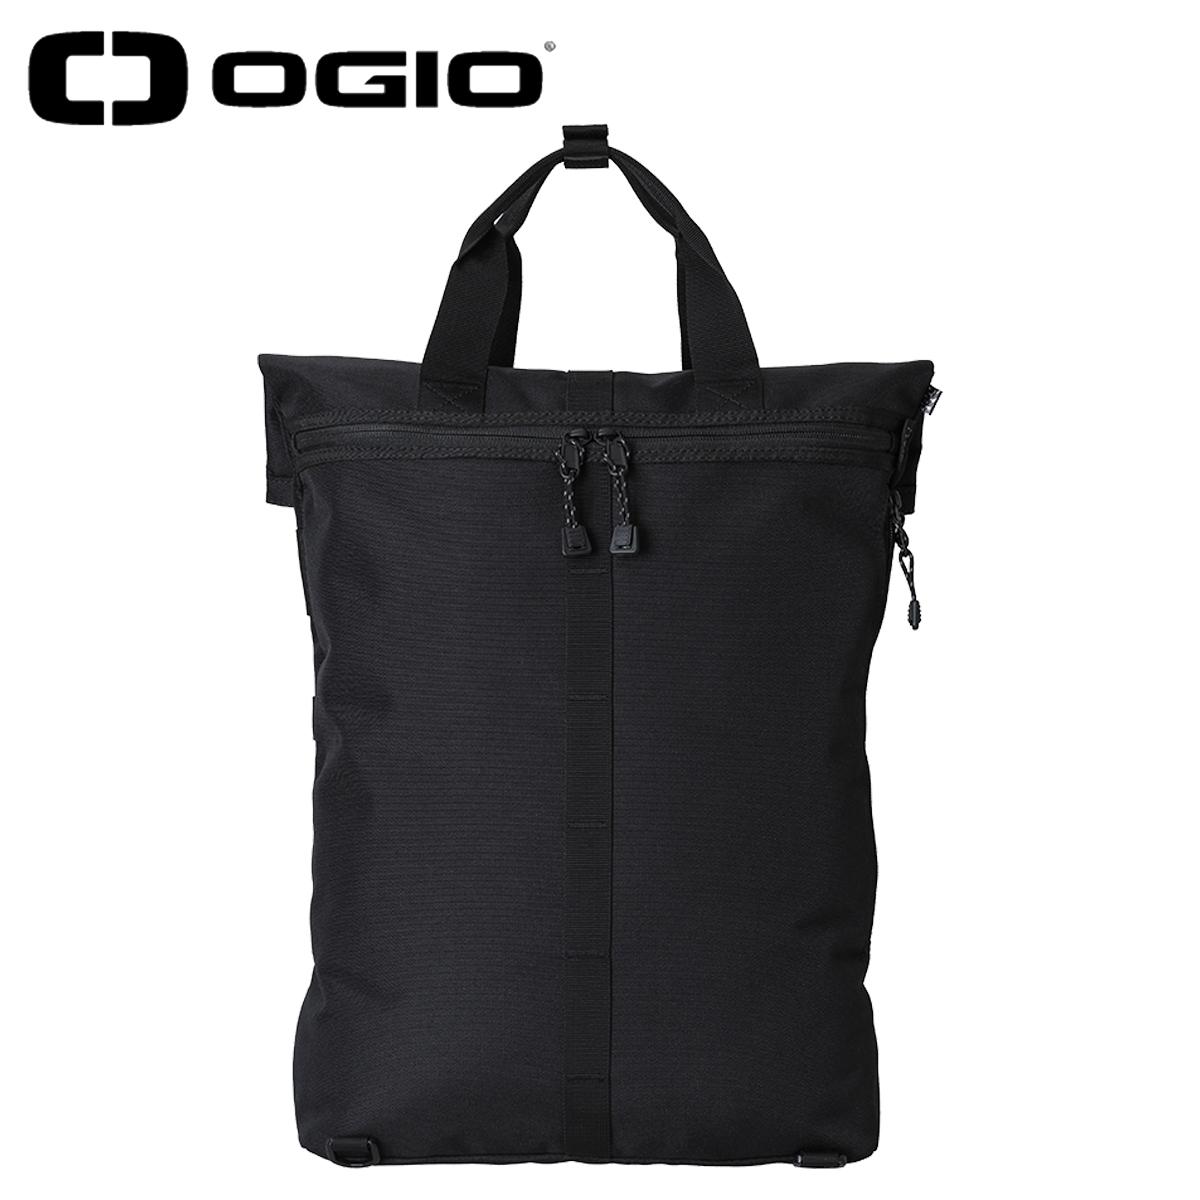 OGIO オジオ リュック バッグ バックパック トートバッグ ビジネス メンズ 20L CORE CONVOY 2WAY TOTE 20 JM ブラック 黒 5920159OG